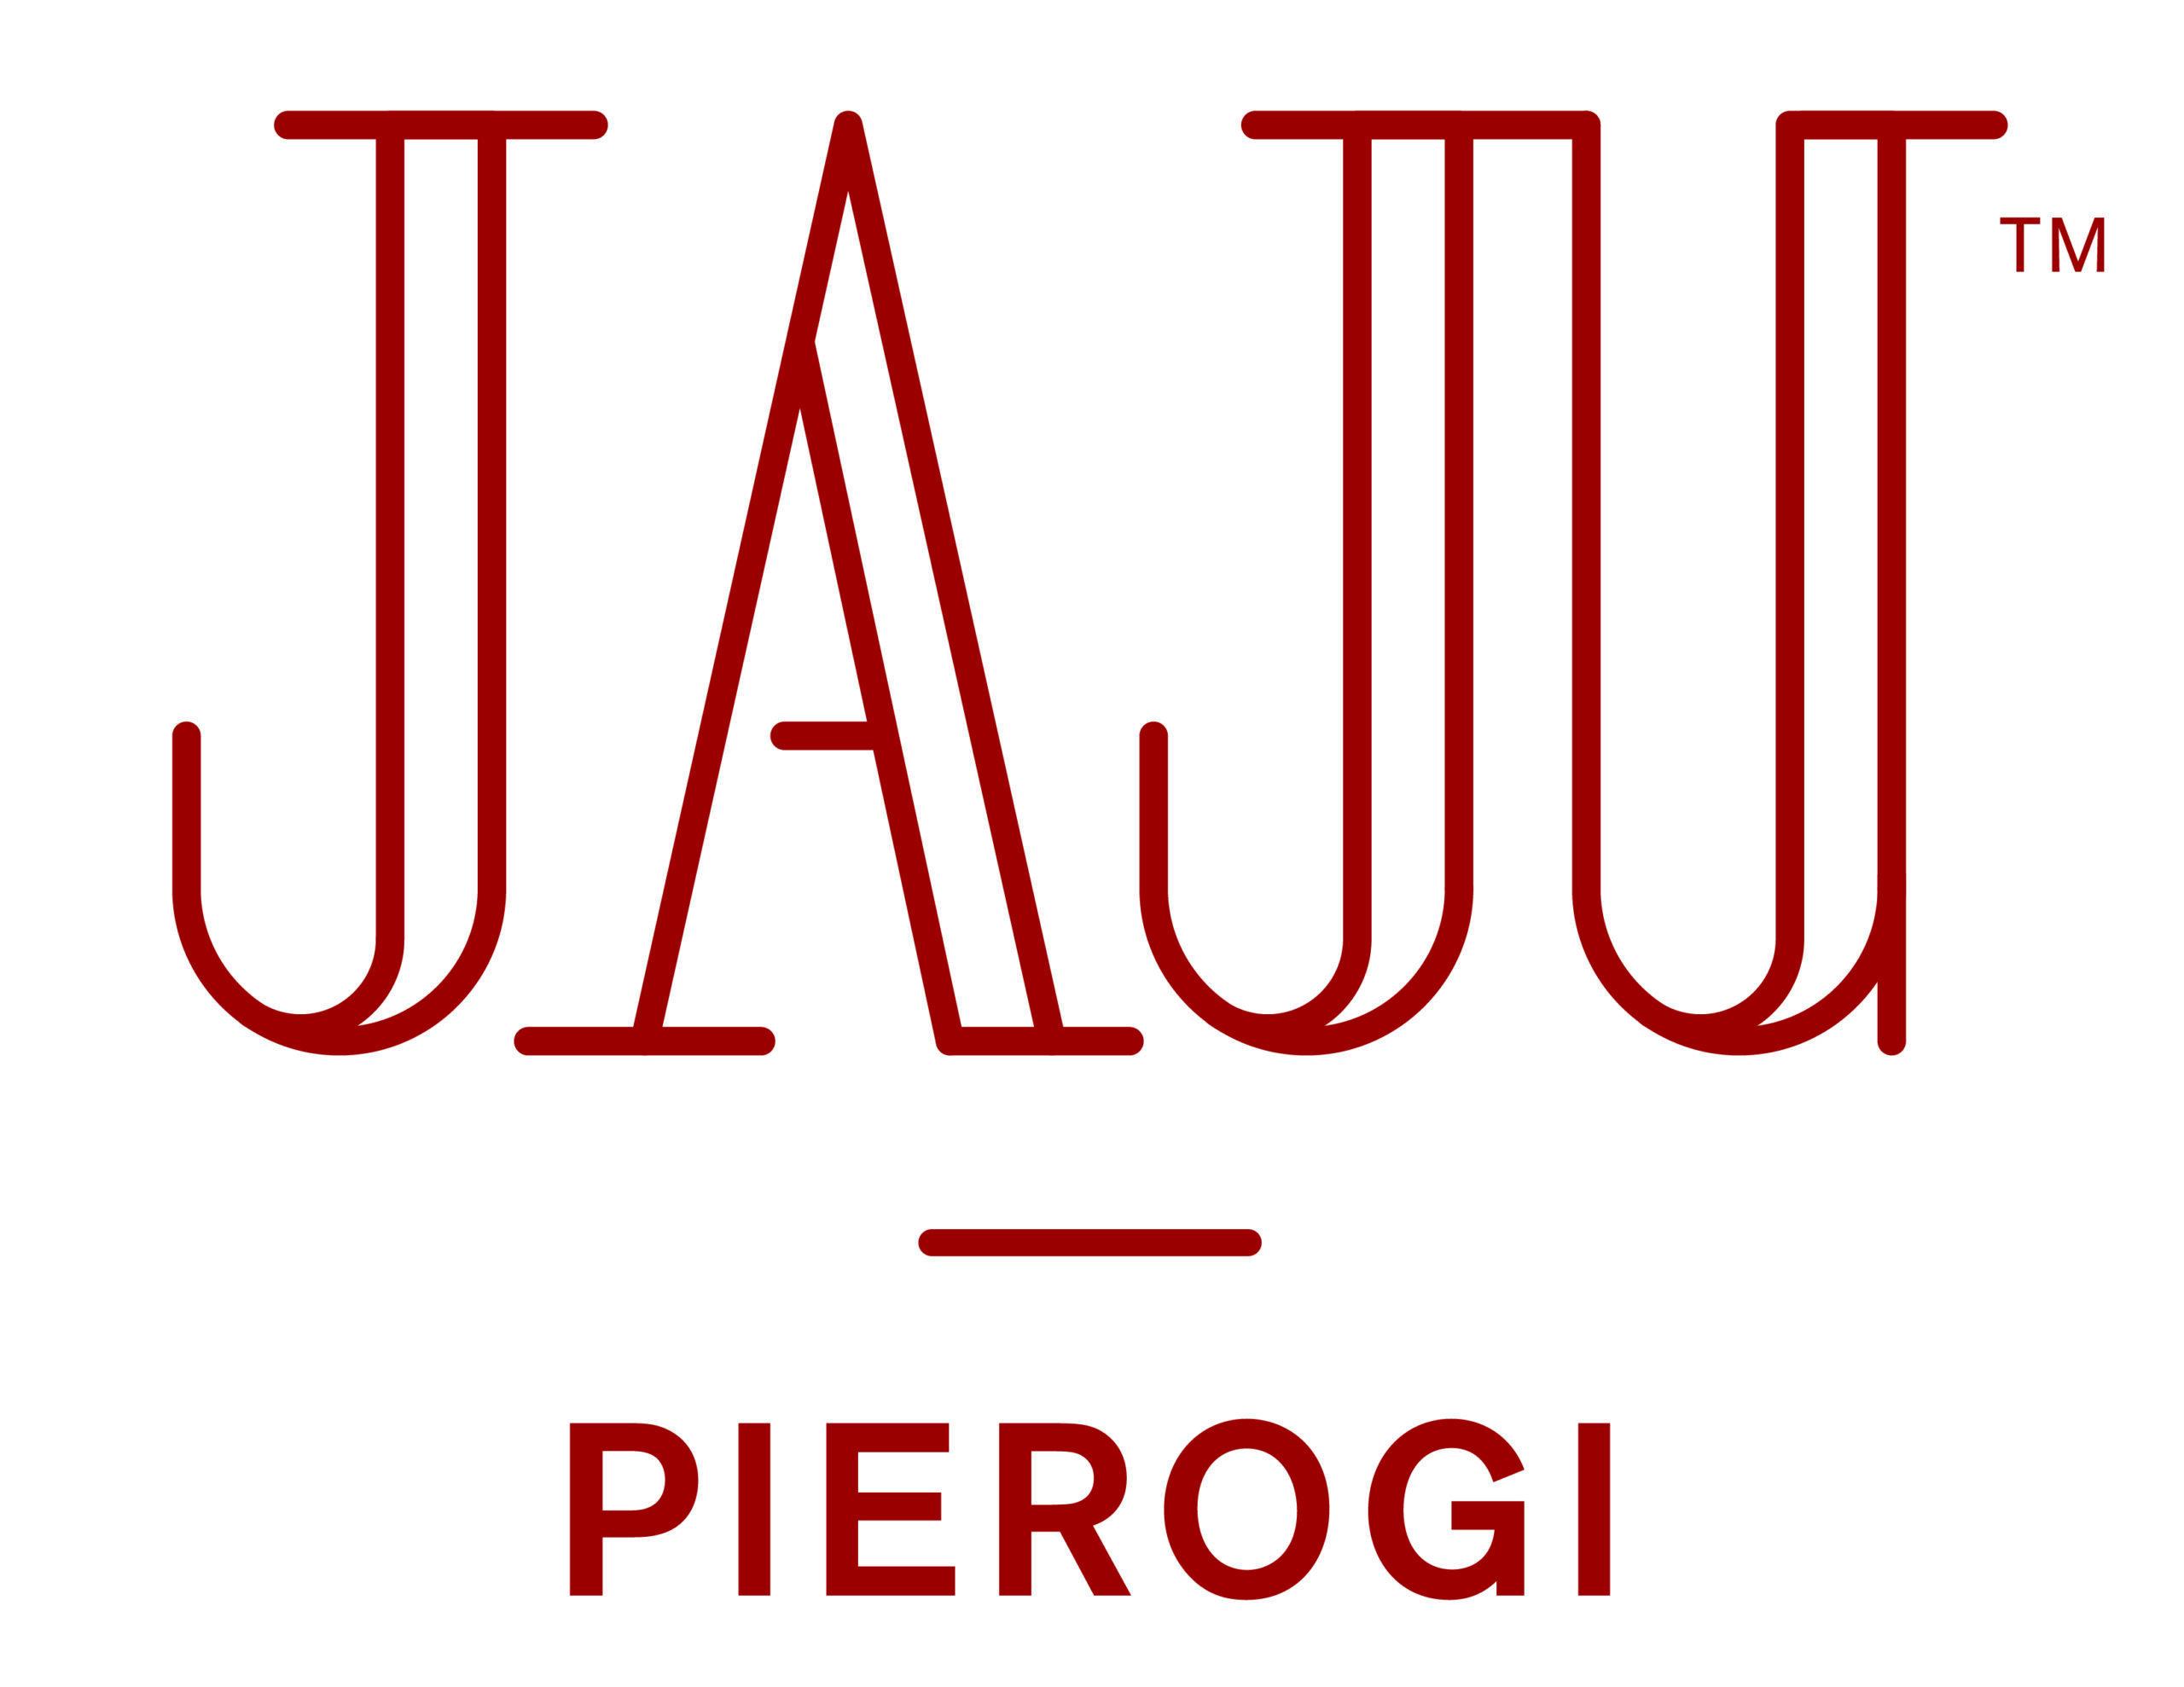 Jaju Pierogi